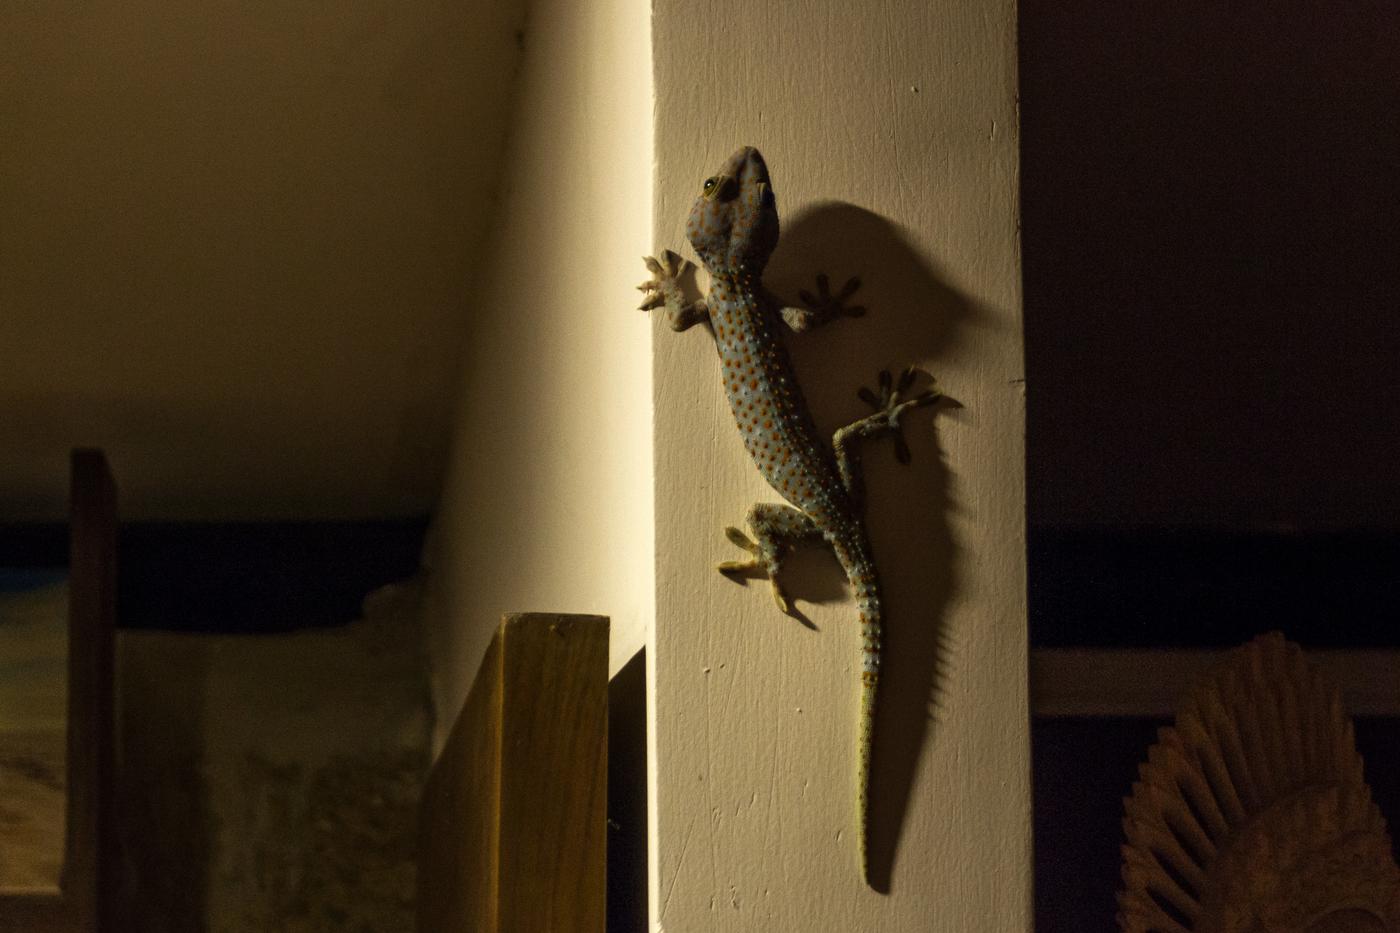 Gecko-phu-quoc.jpg